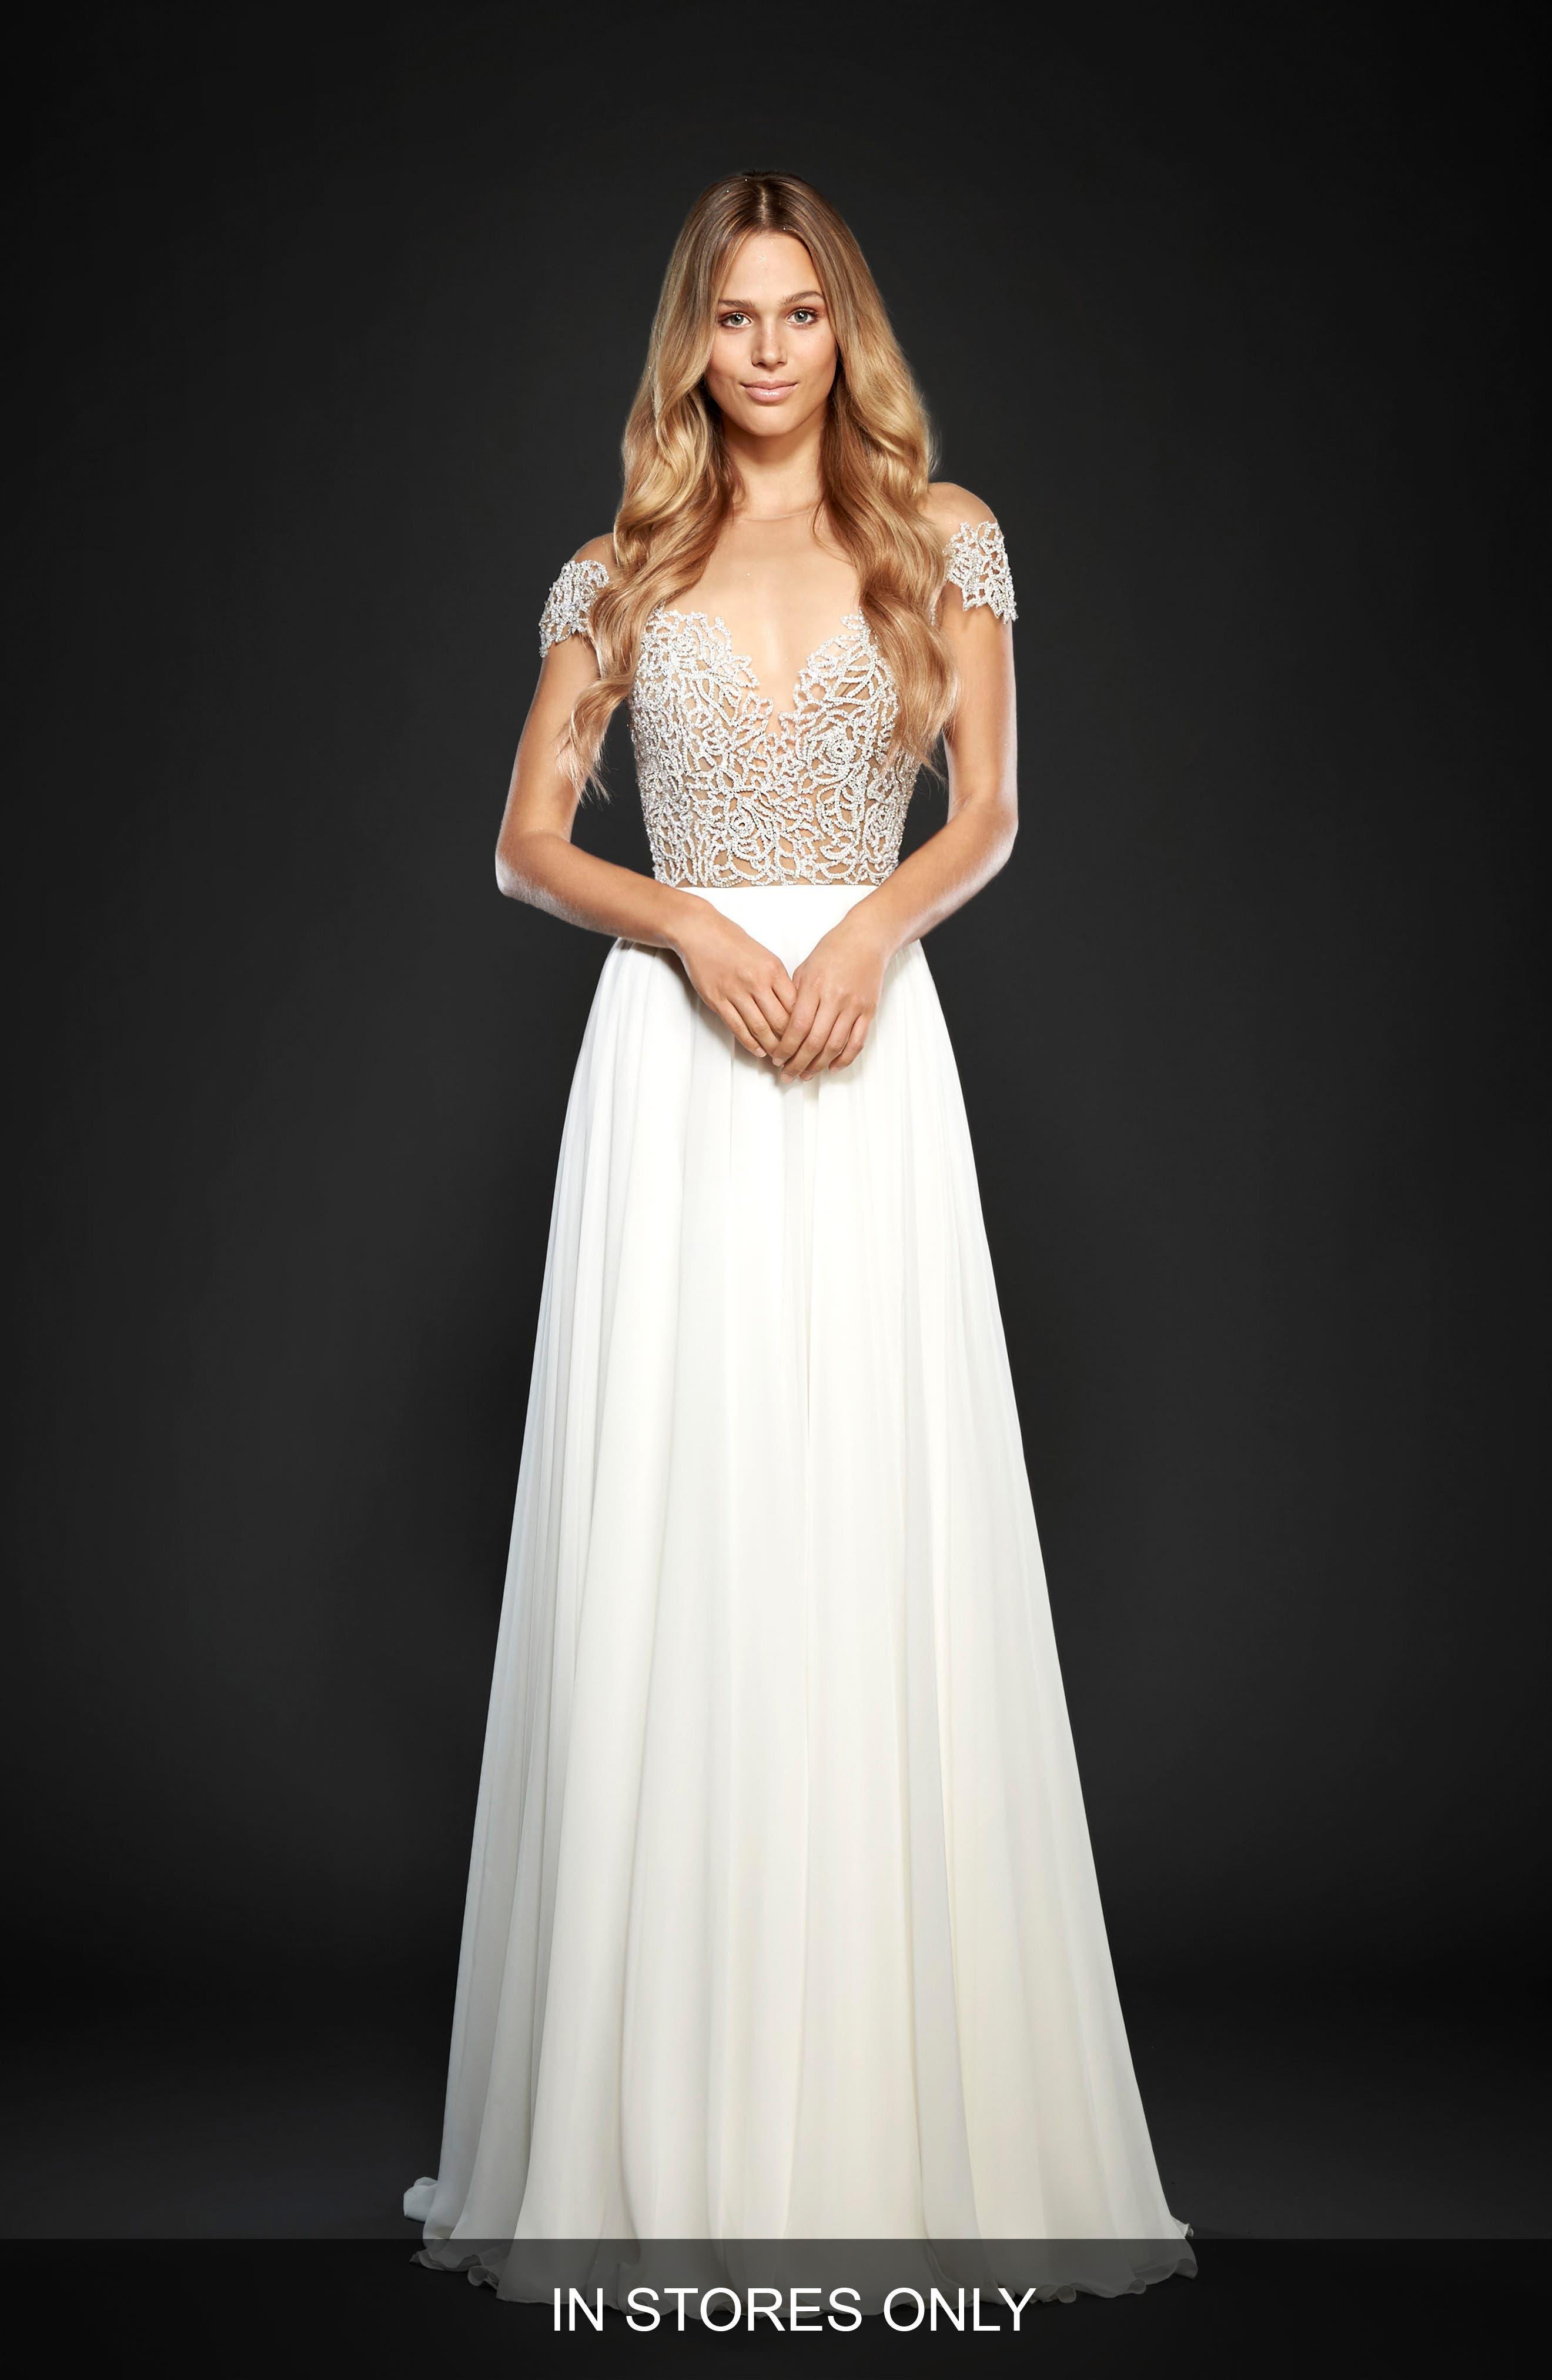 HAYLEY PAIGE Celine Embellished Illusion & Chiffon A-Line